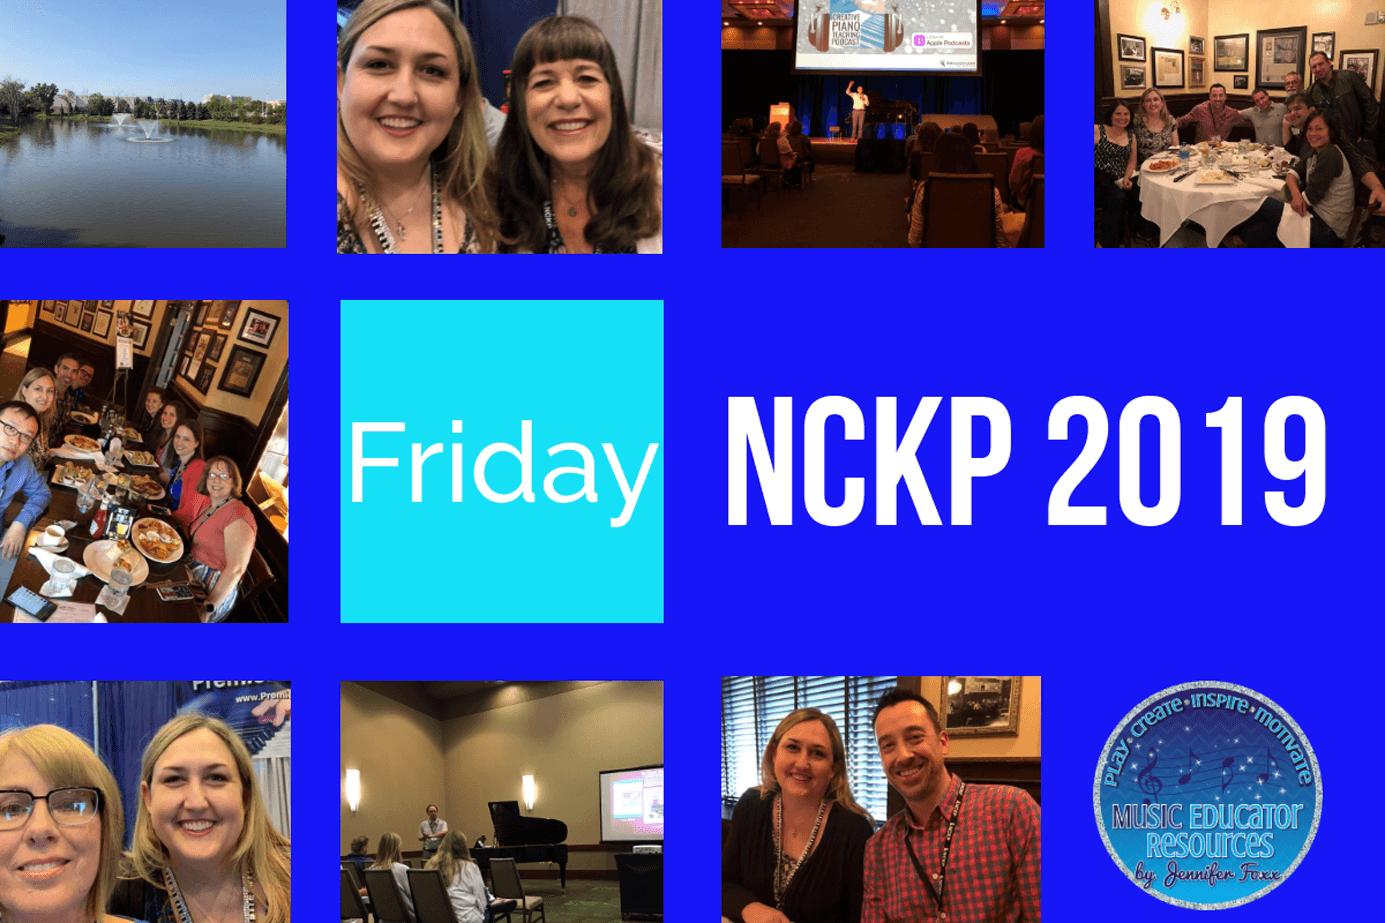 NCKP 2019 Conference Friday